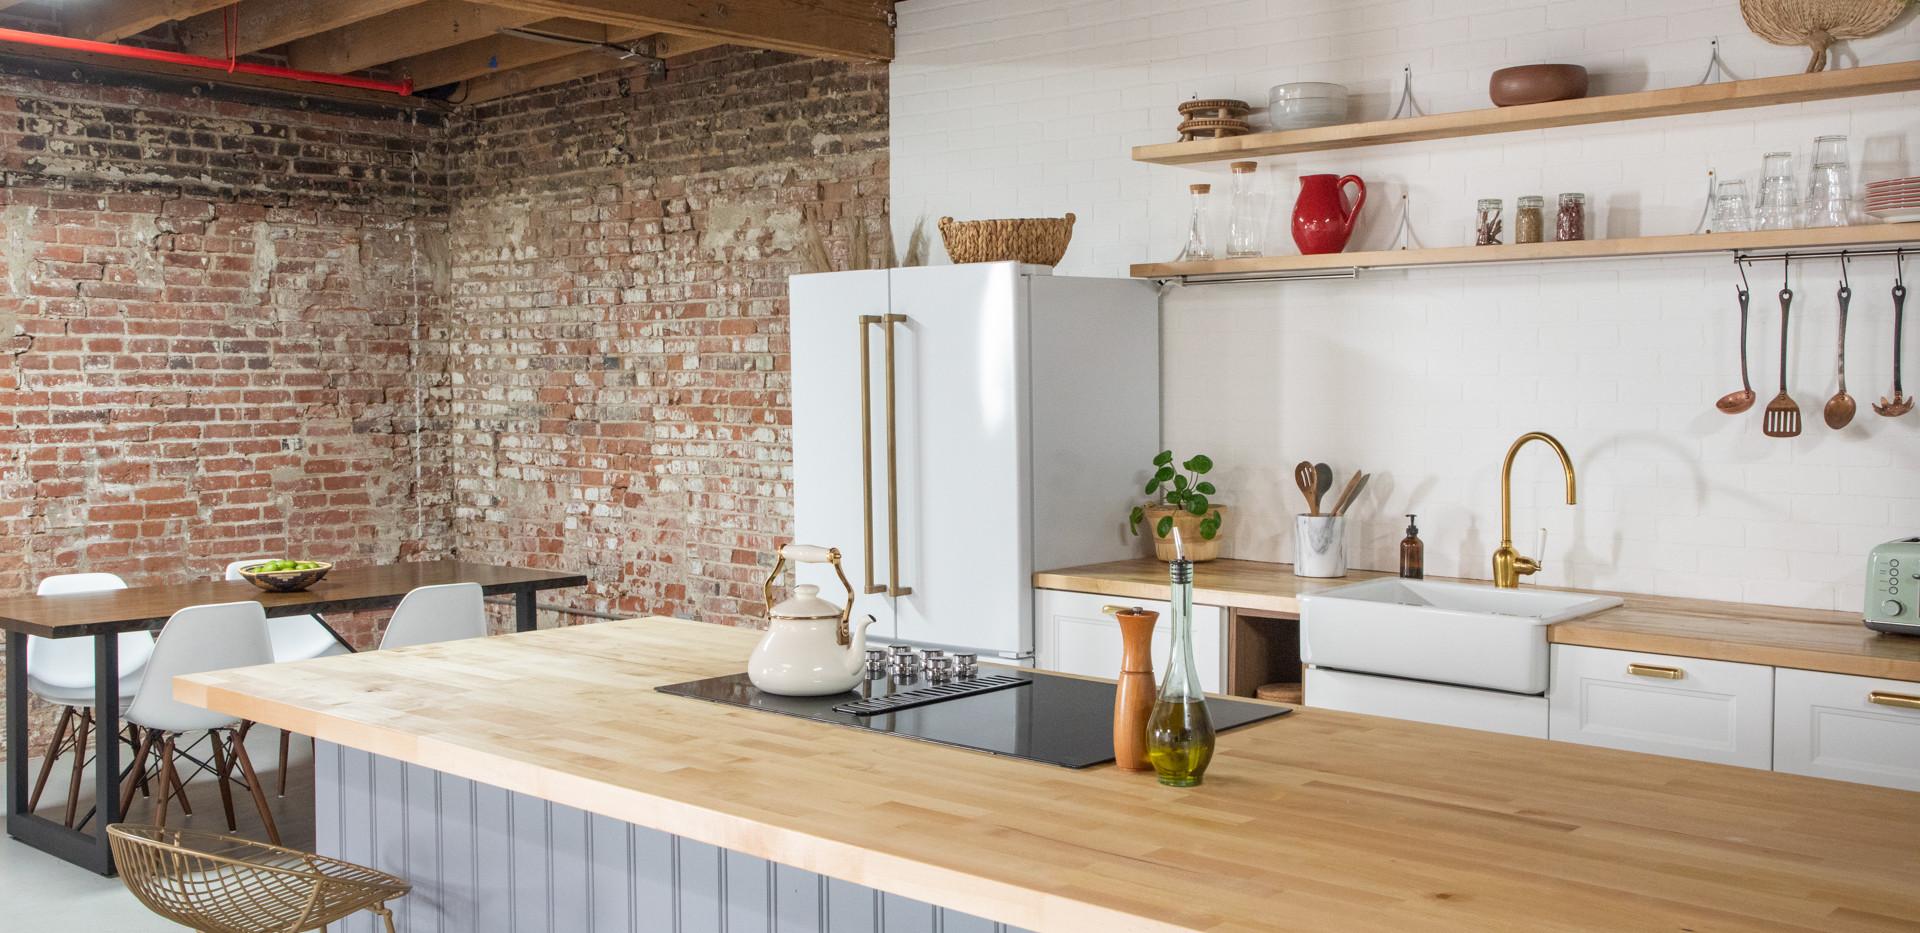 Jikoni Studios Kitchen Studio Rental_Kit